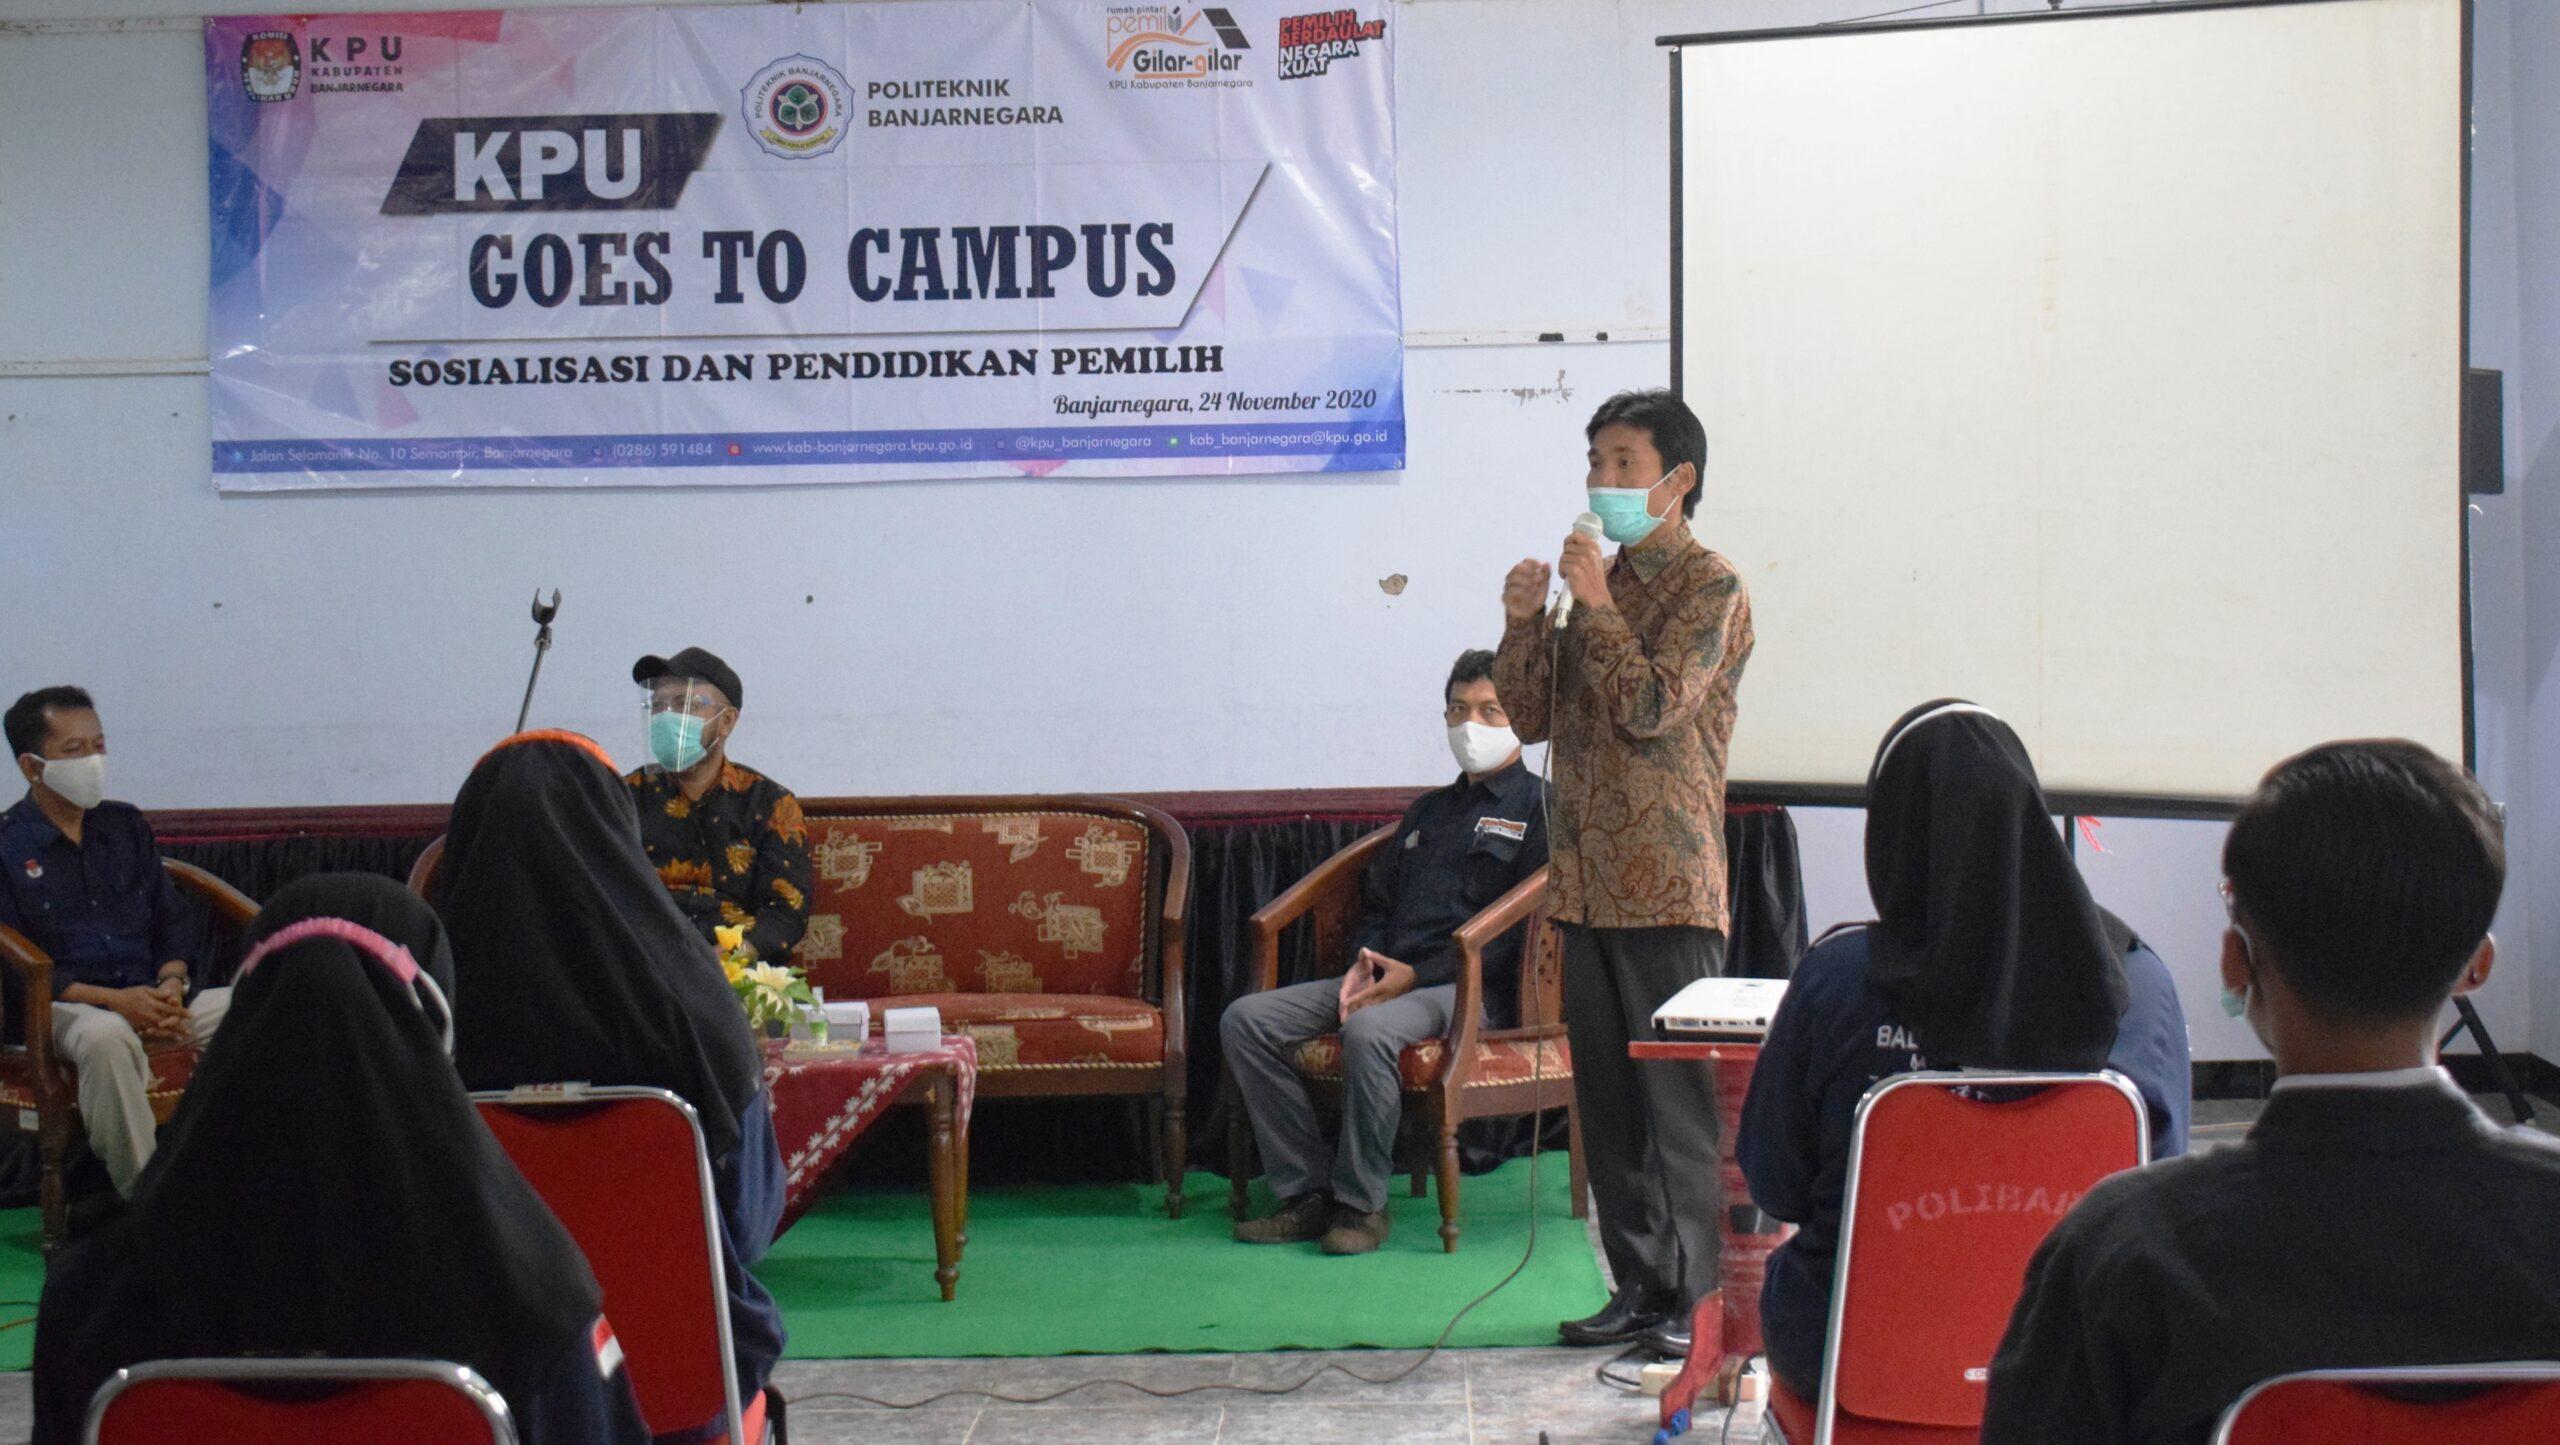 Gelar Pendidikan Politik, KPU Banjarnegara Goes To Campus Polibara